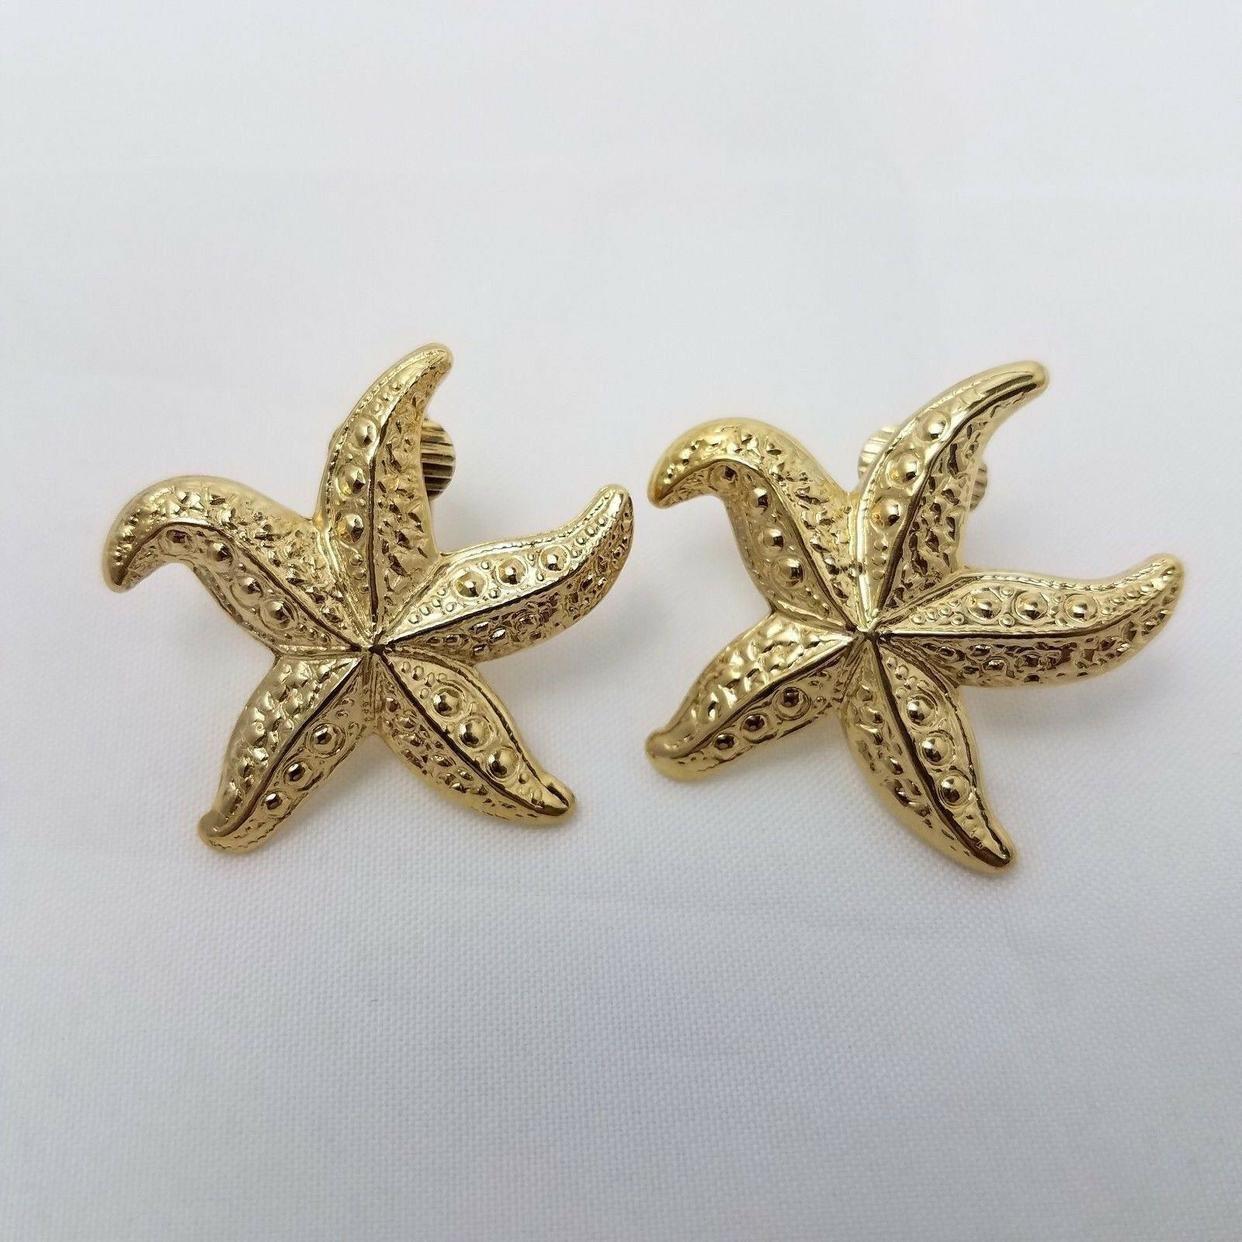 GOLD TONE STARFISH Earrings Vintage